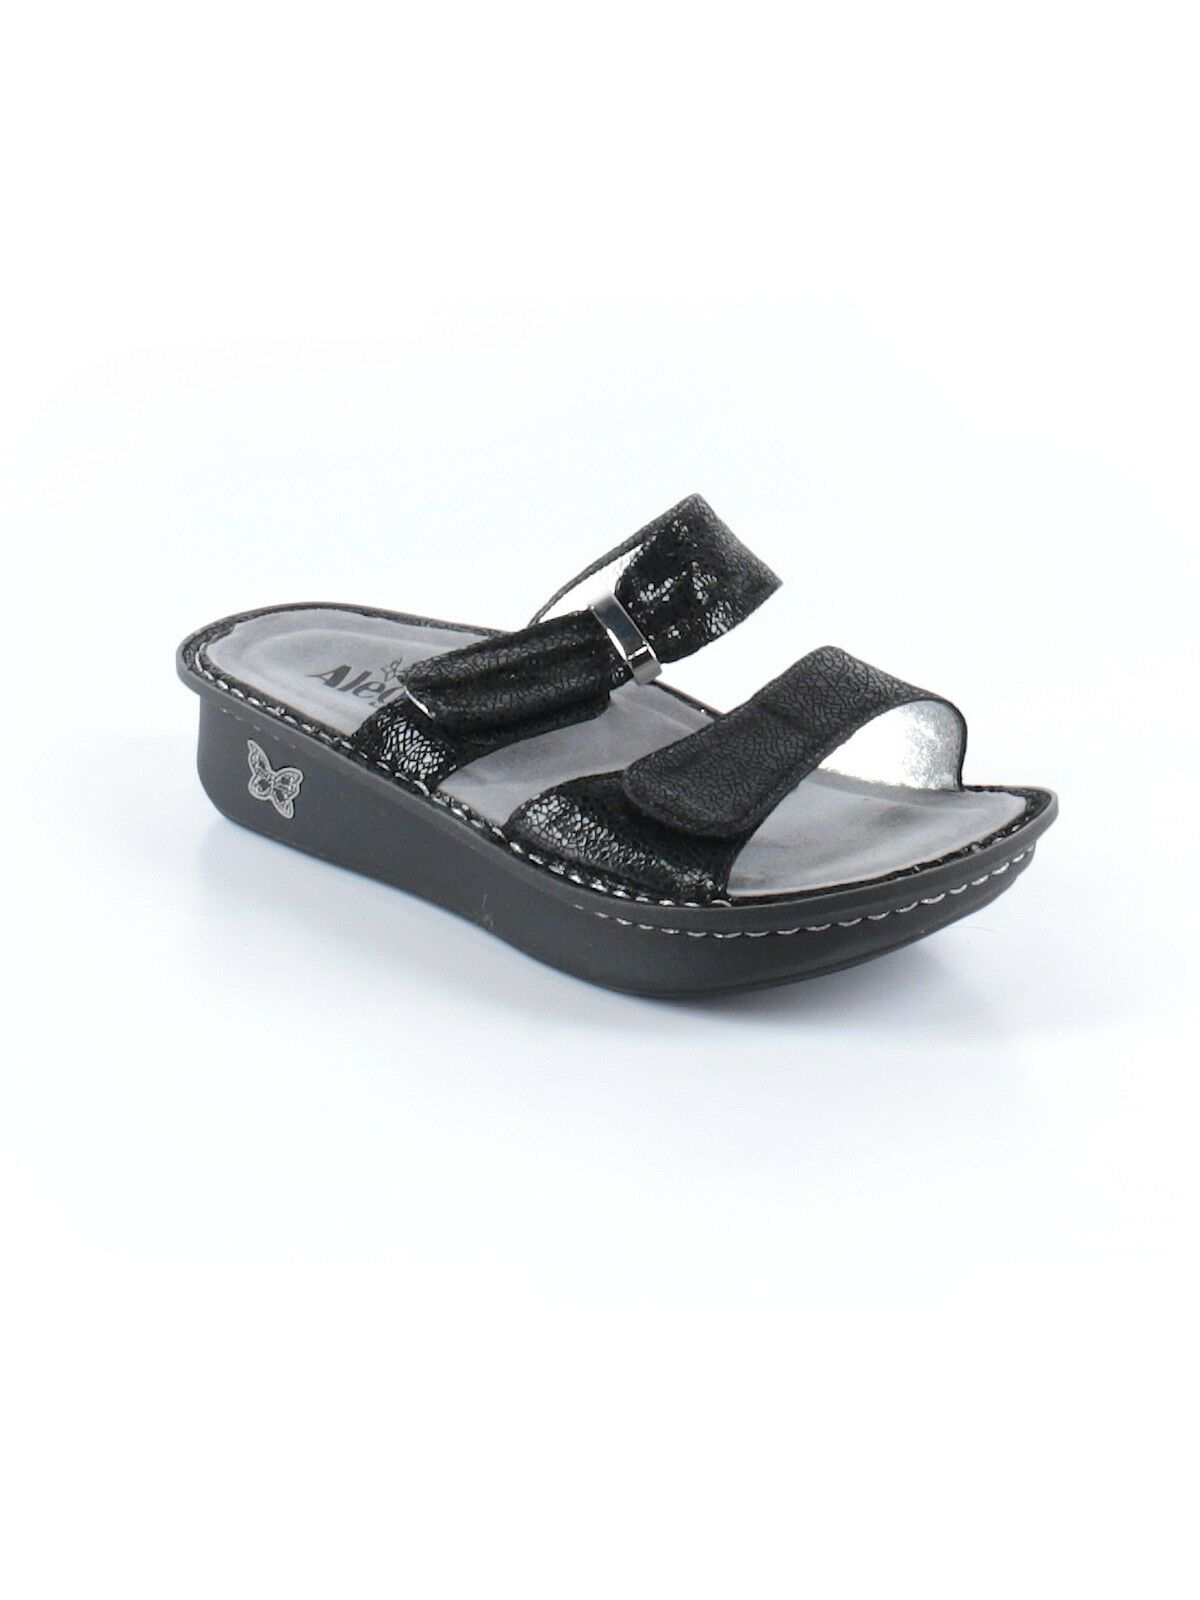 Women Alegria Karmen Pewter Dazzler Dual Strap Slide Sandal shoes Size 36